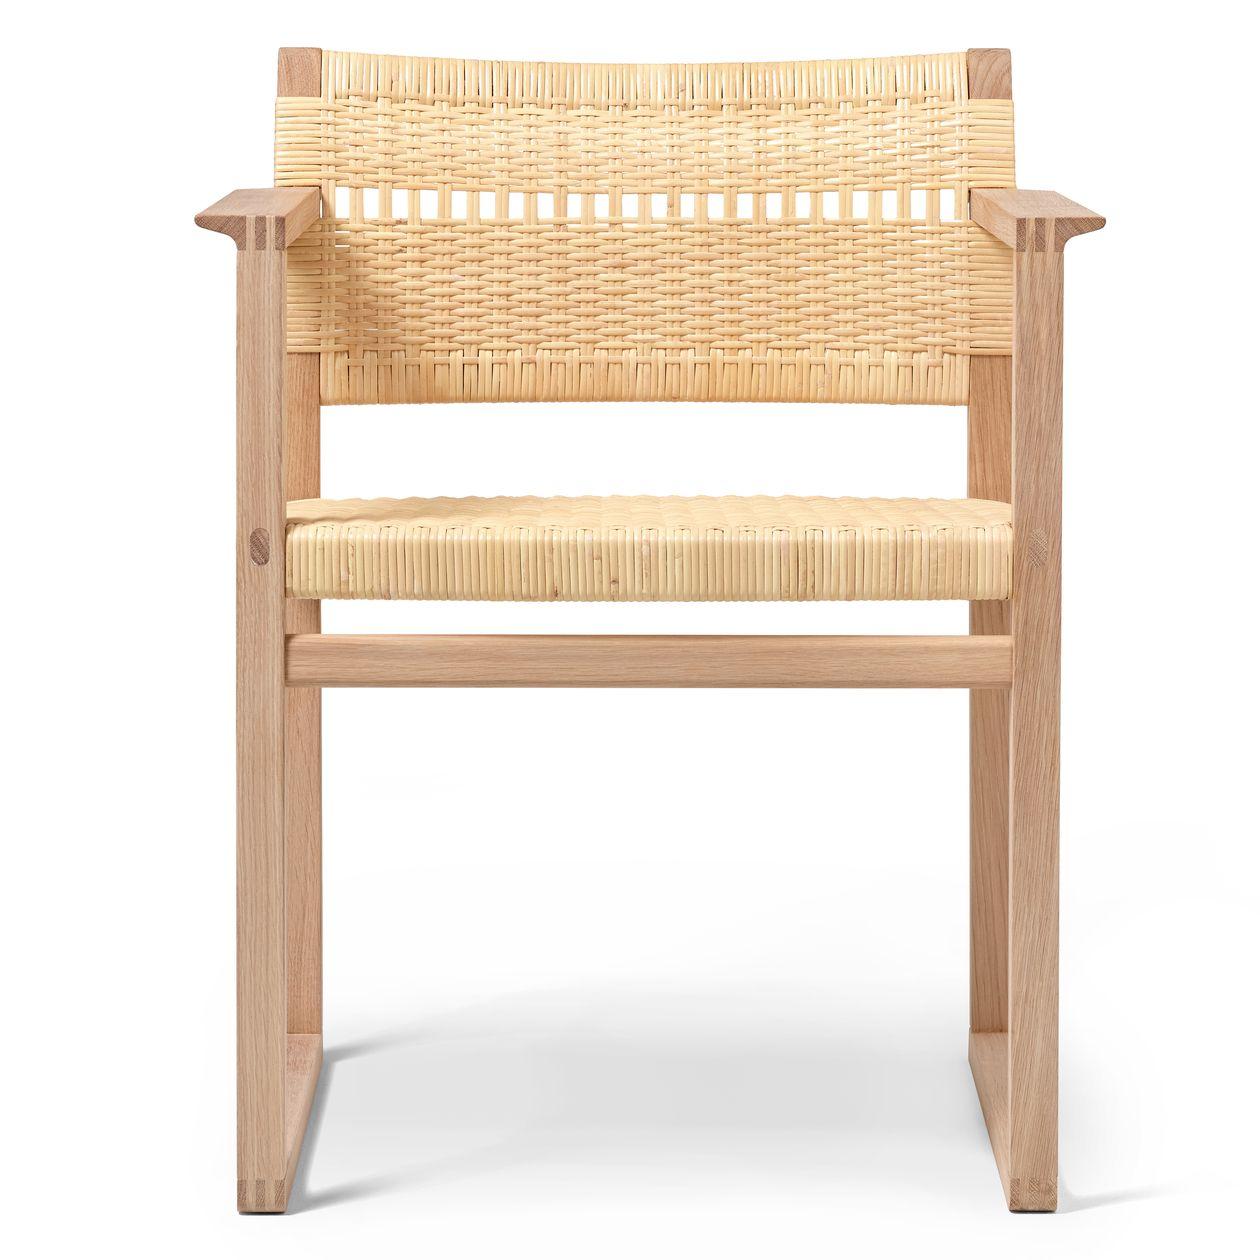 Fredericia's BM62 chair